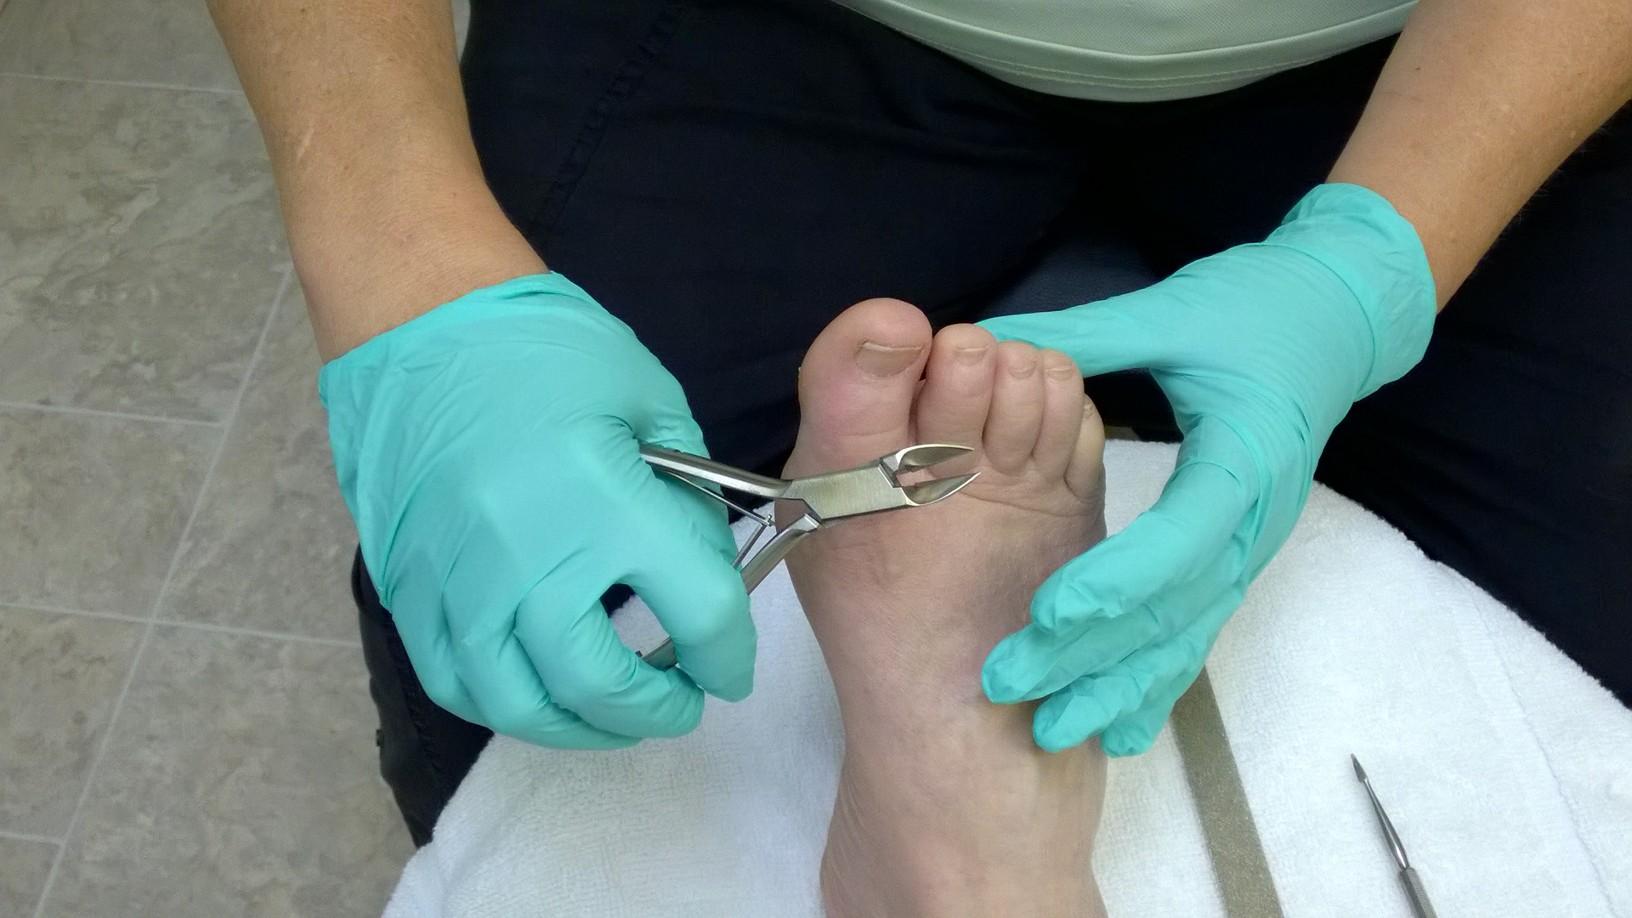 Foot care nurse at work